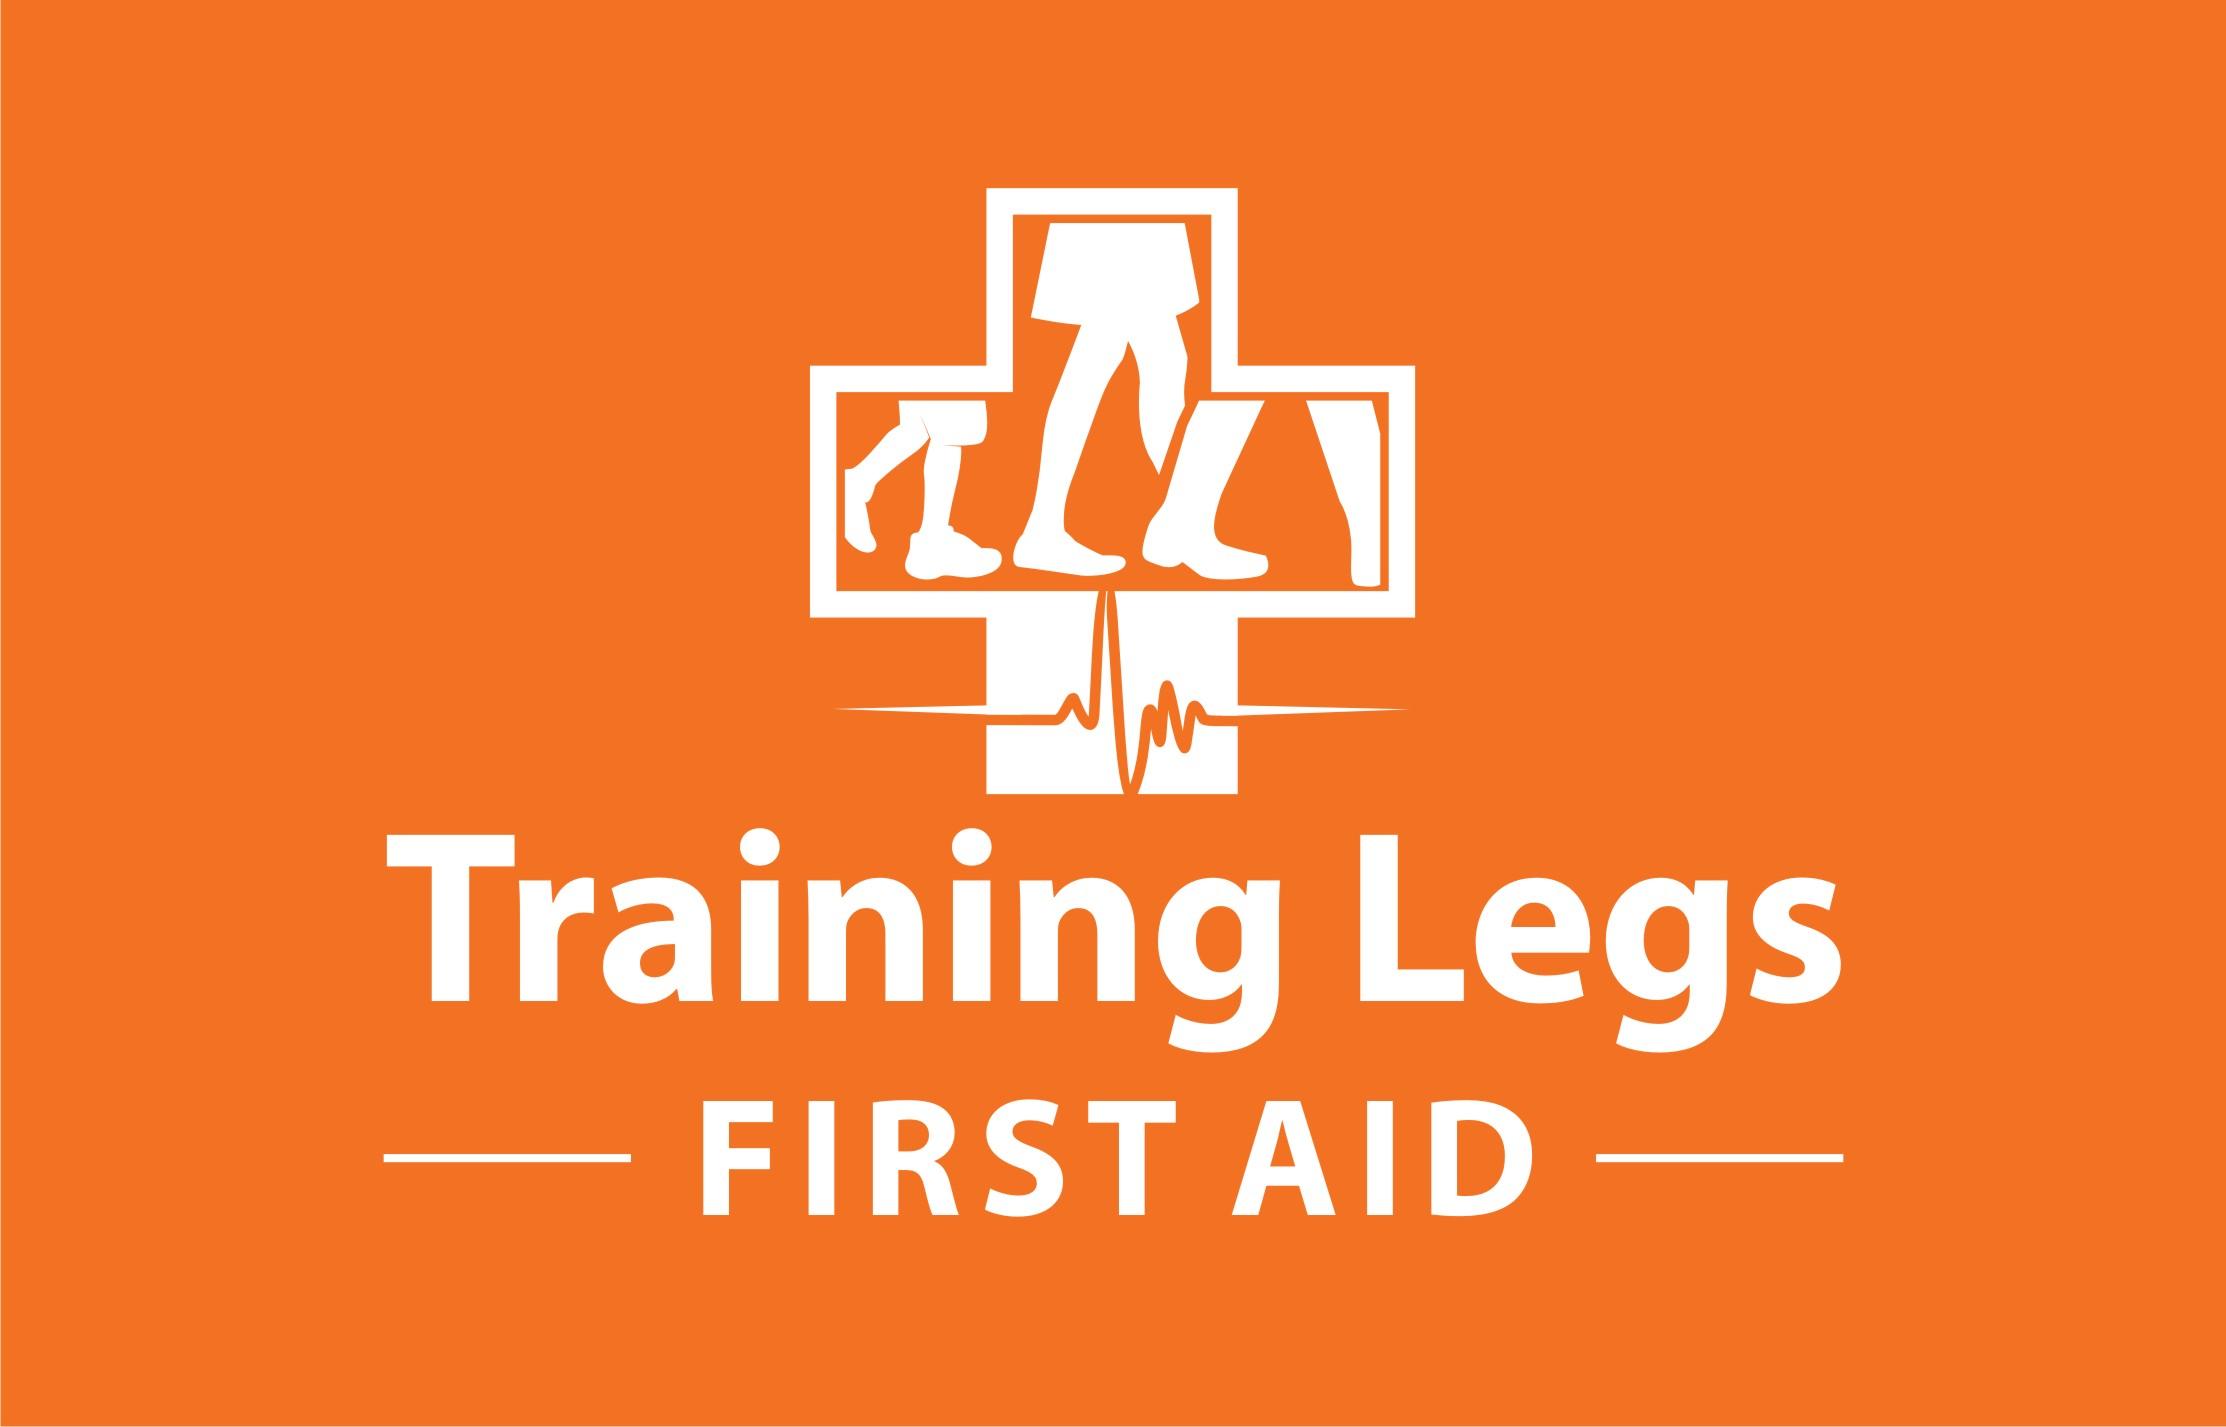 Training Legs First Aid.jpg